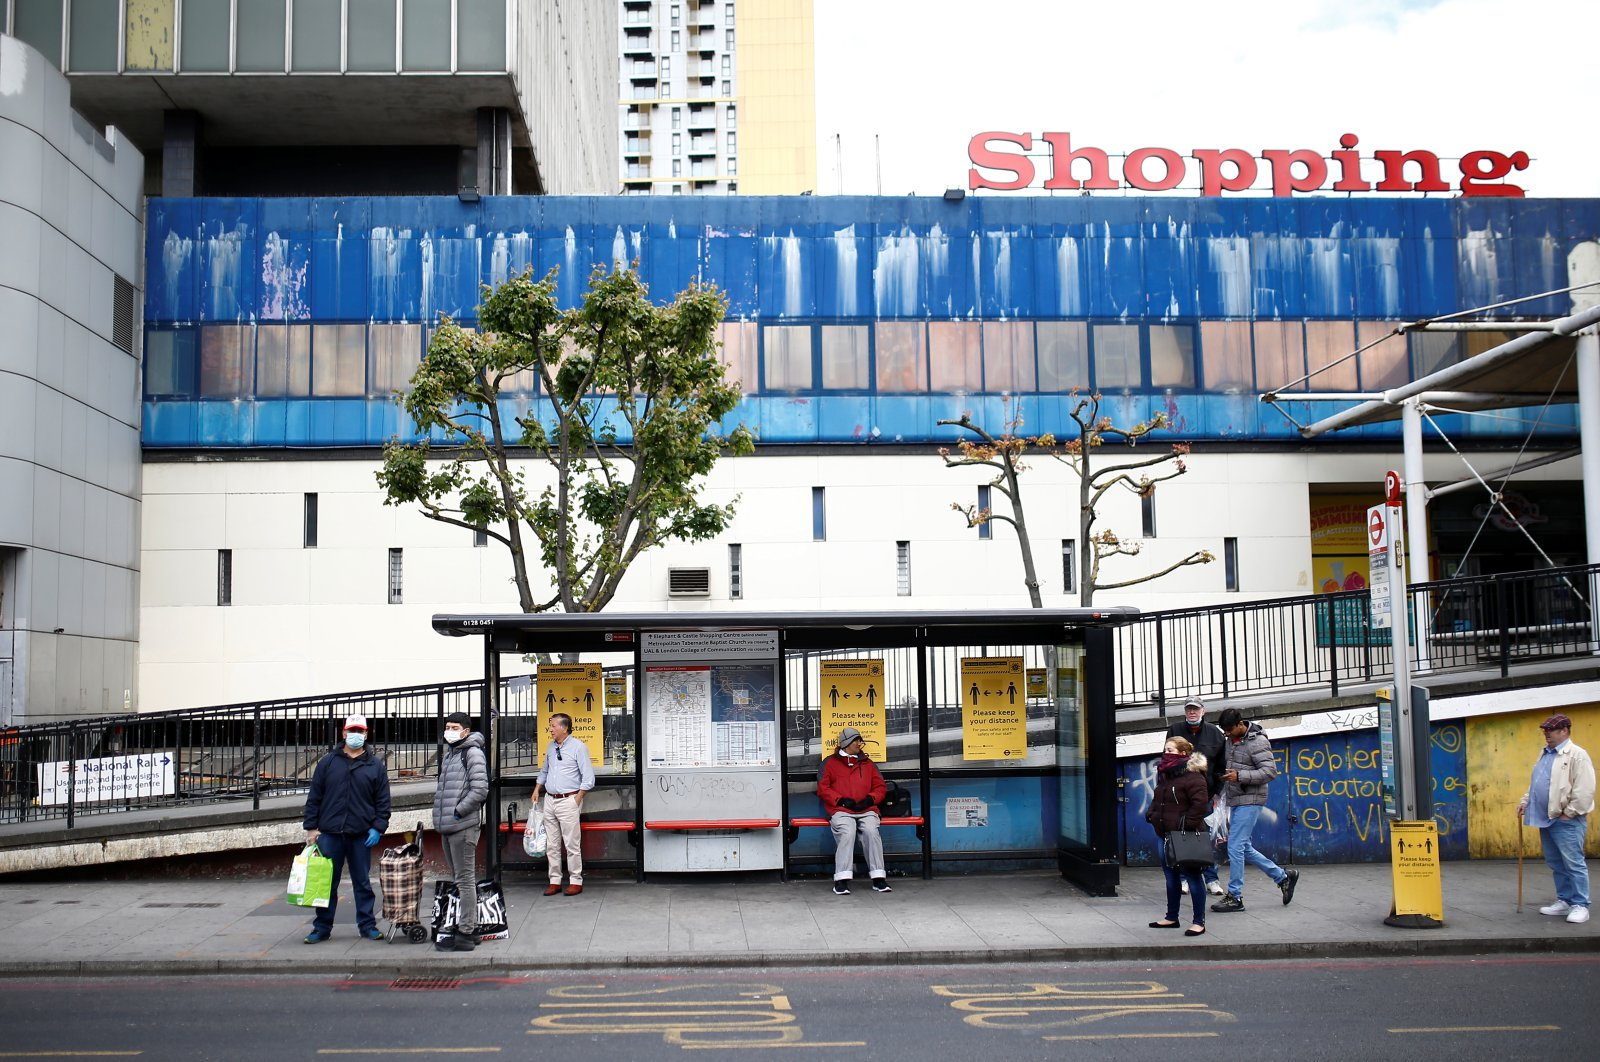 People wait at a bus stop, London, Britain, May 13, 2020. (Reuters Photo)